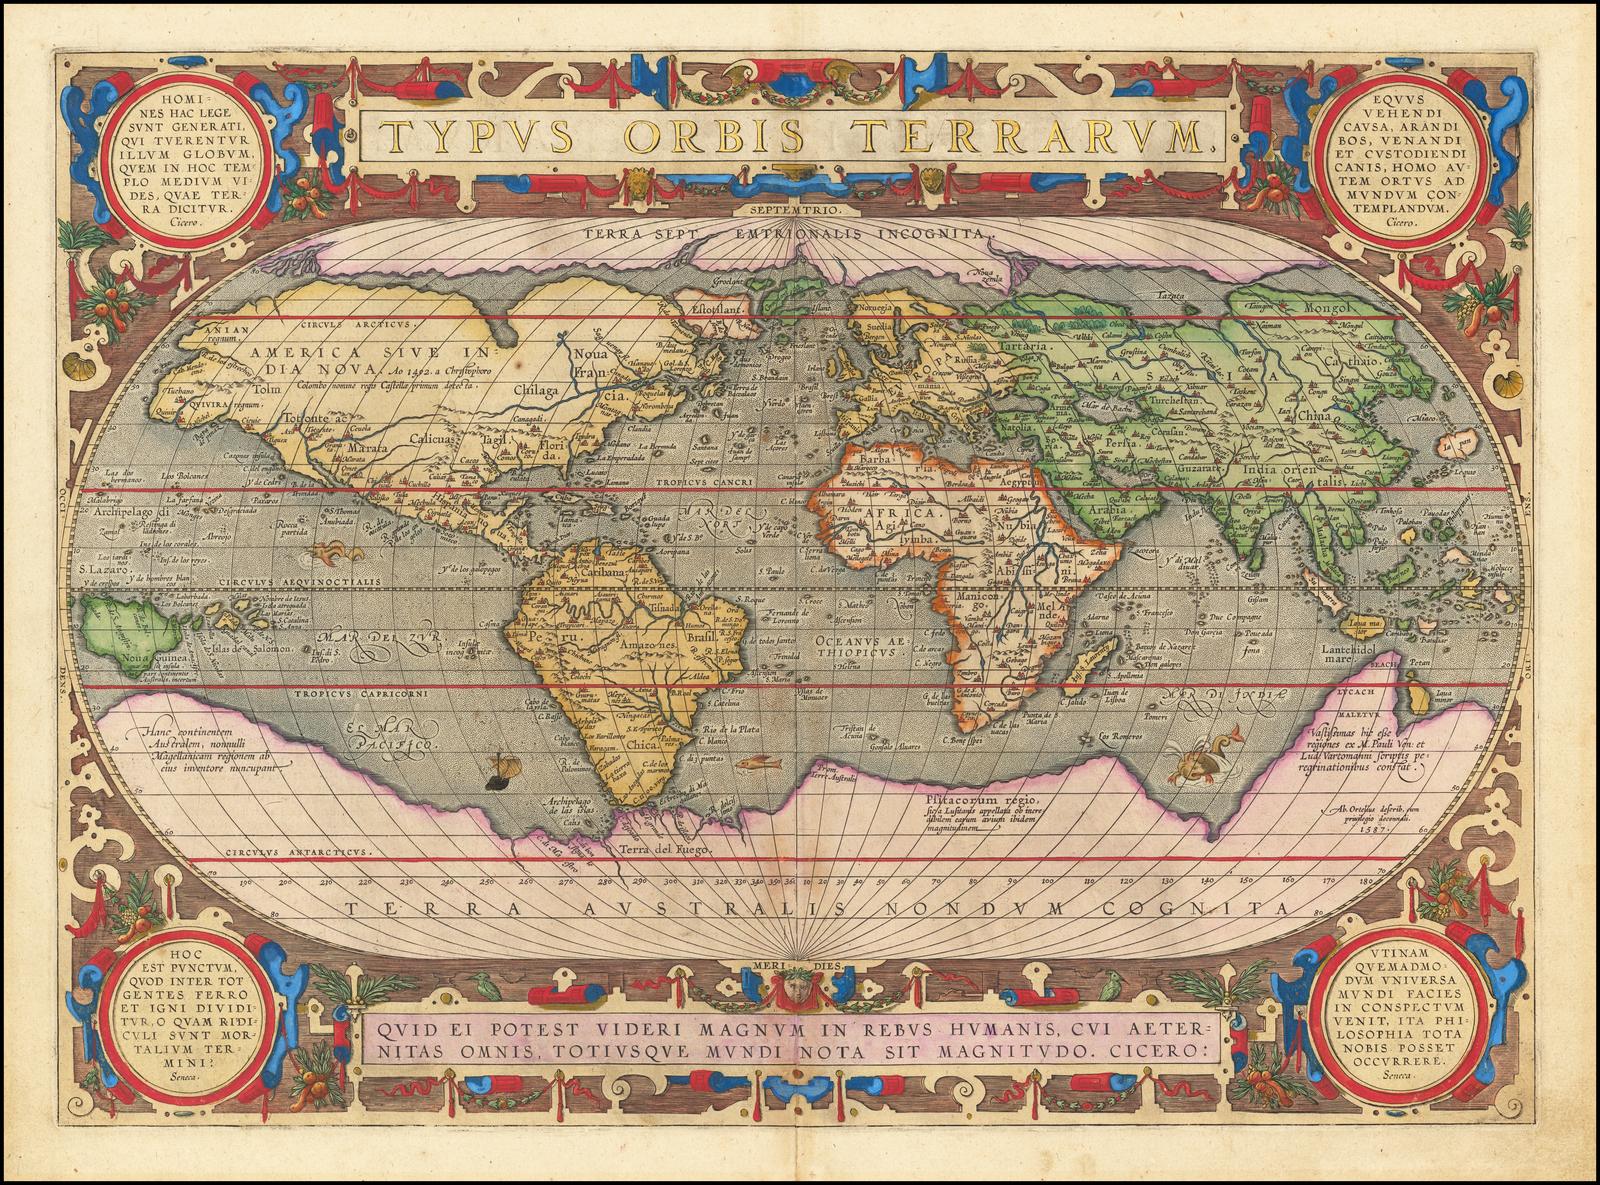 Typus Orbis Terrarum - Barry Lawrence Ruderman Antique Maps Inc